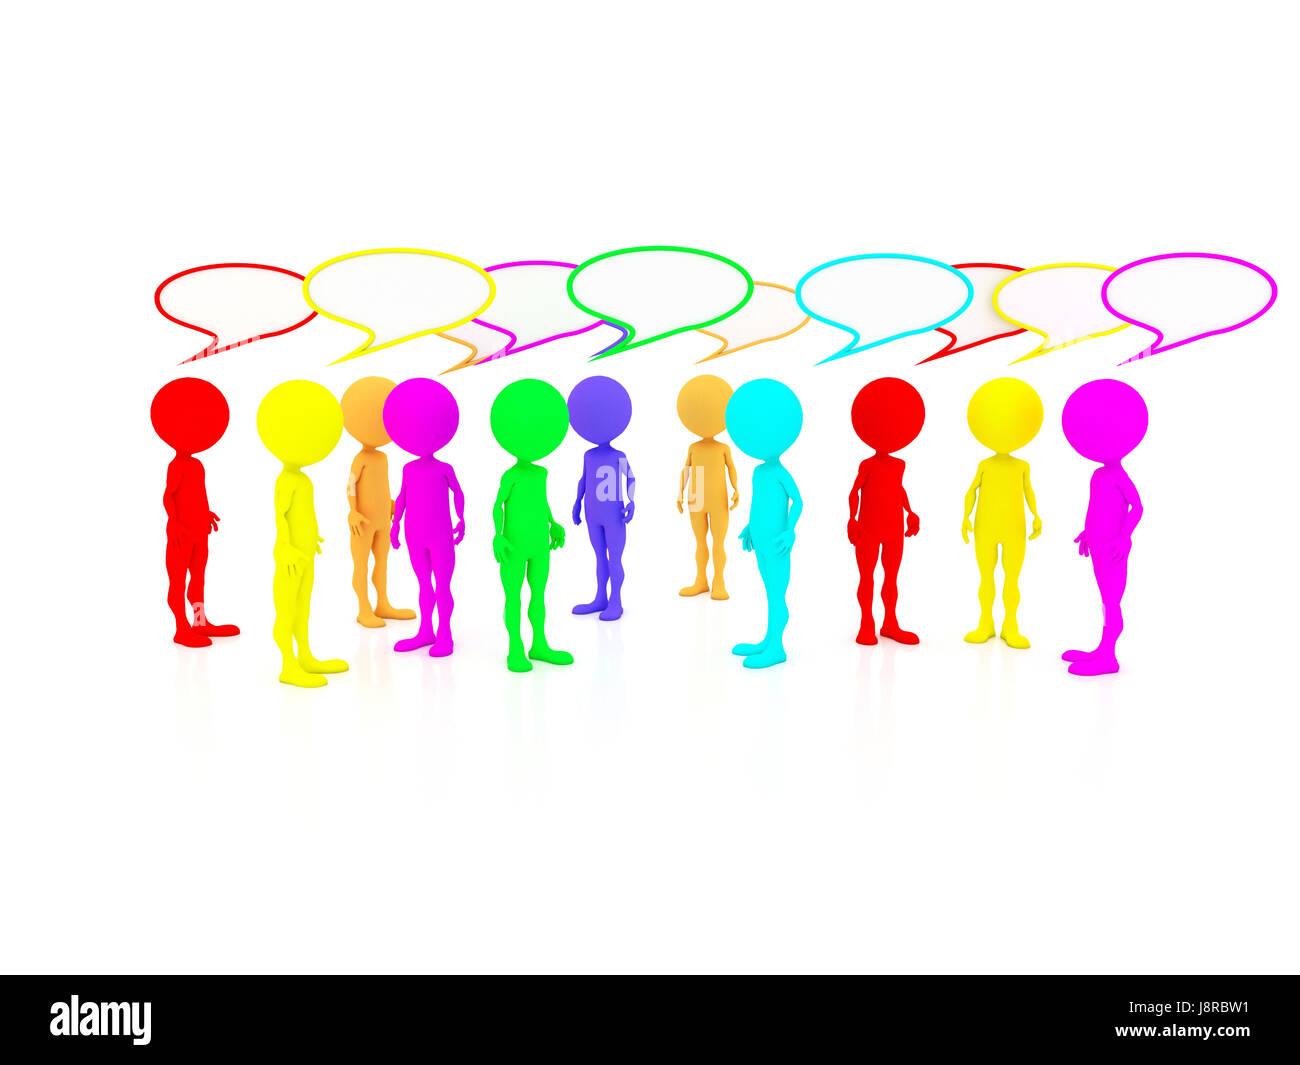 talk, speaking, speaks, spoken, speak, talking, chat, nattering, humans, human - Stock Image